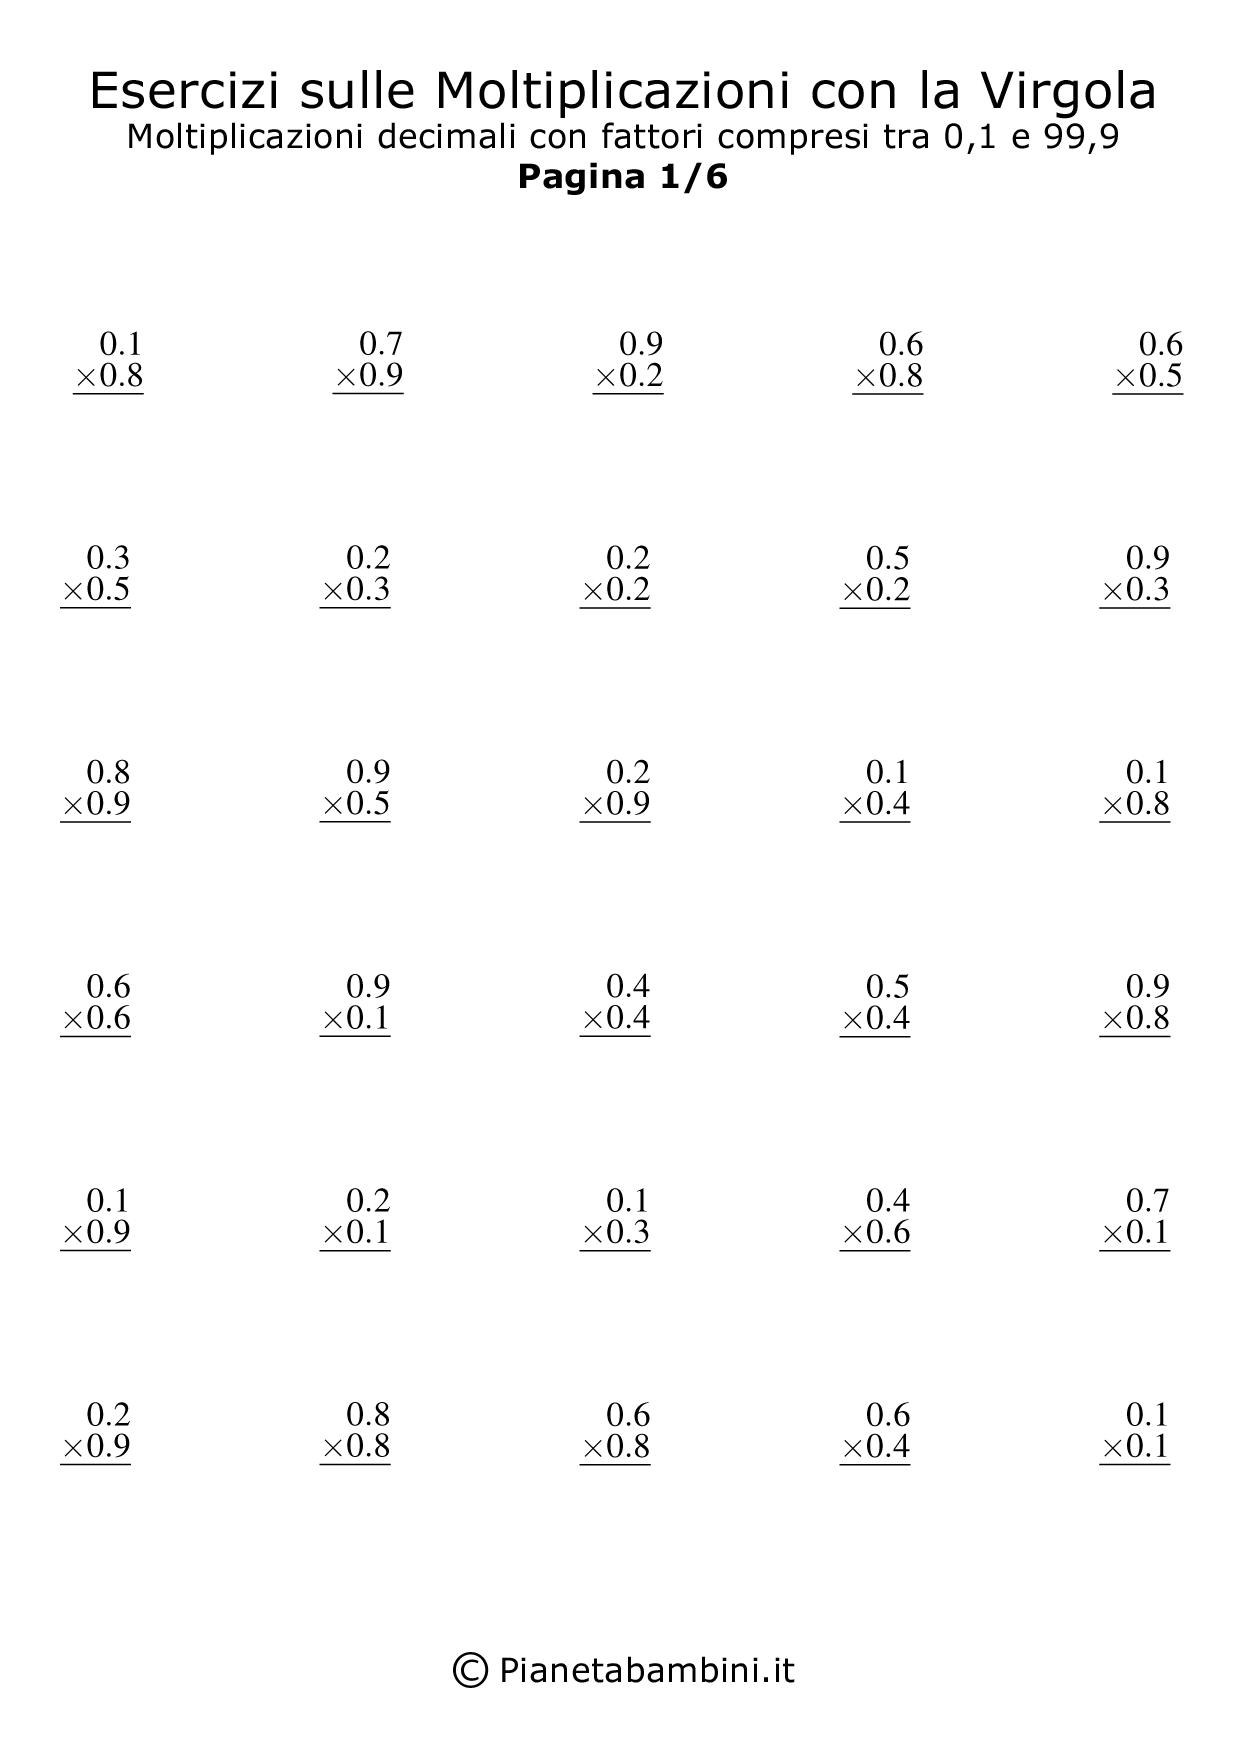 Moltiplicazioni-Virgola-0.1-99.9_1